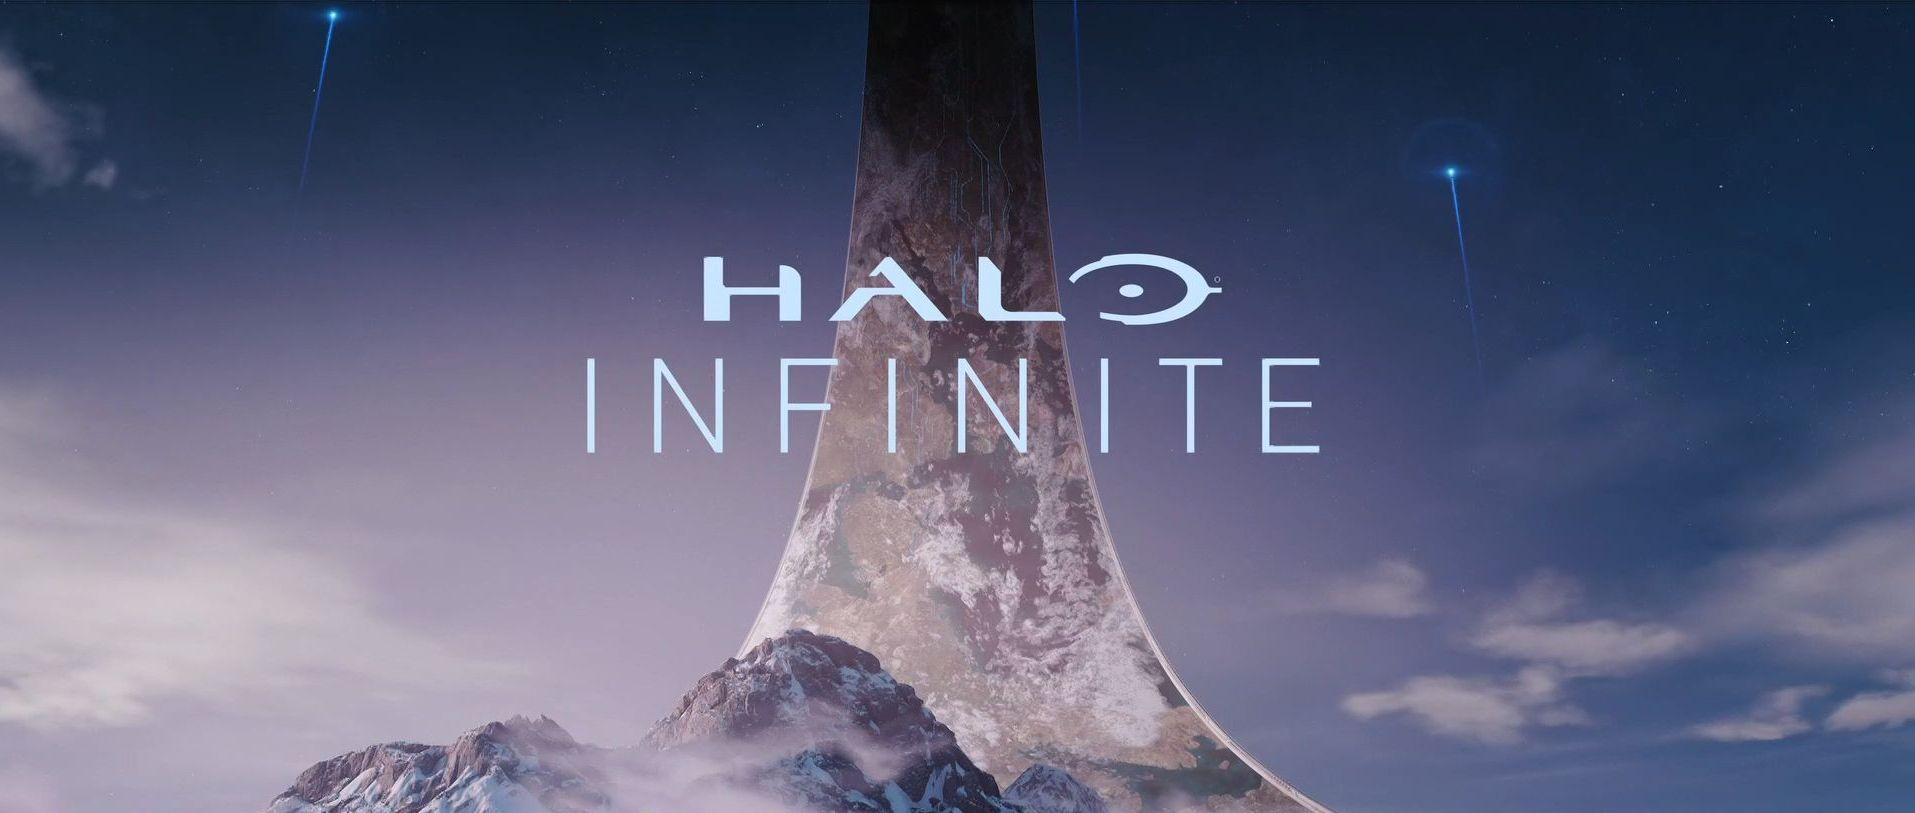 E3 2018 | بازی Halo Infinite معرفی شد